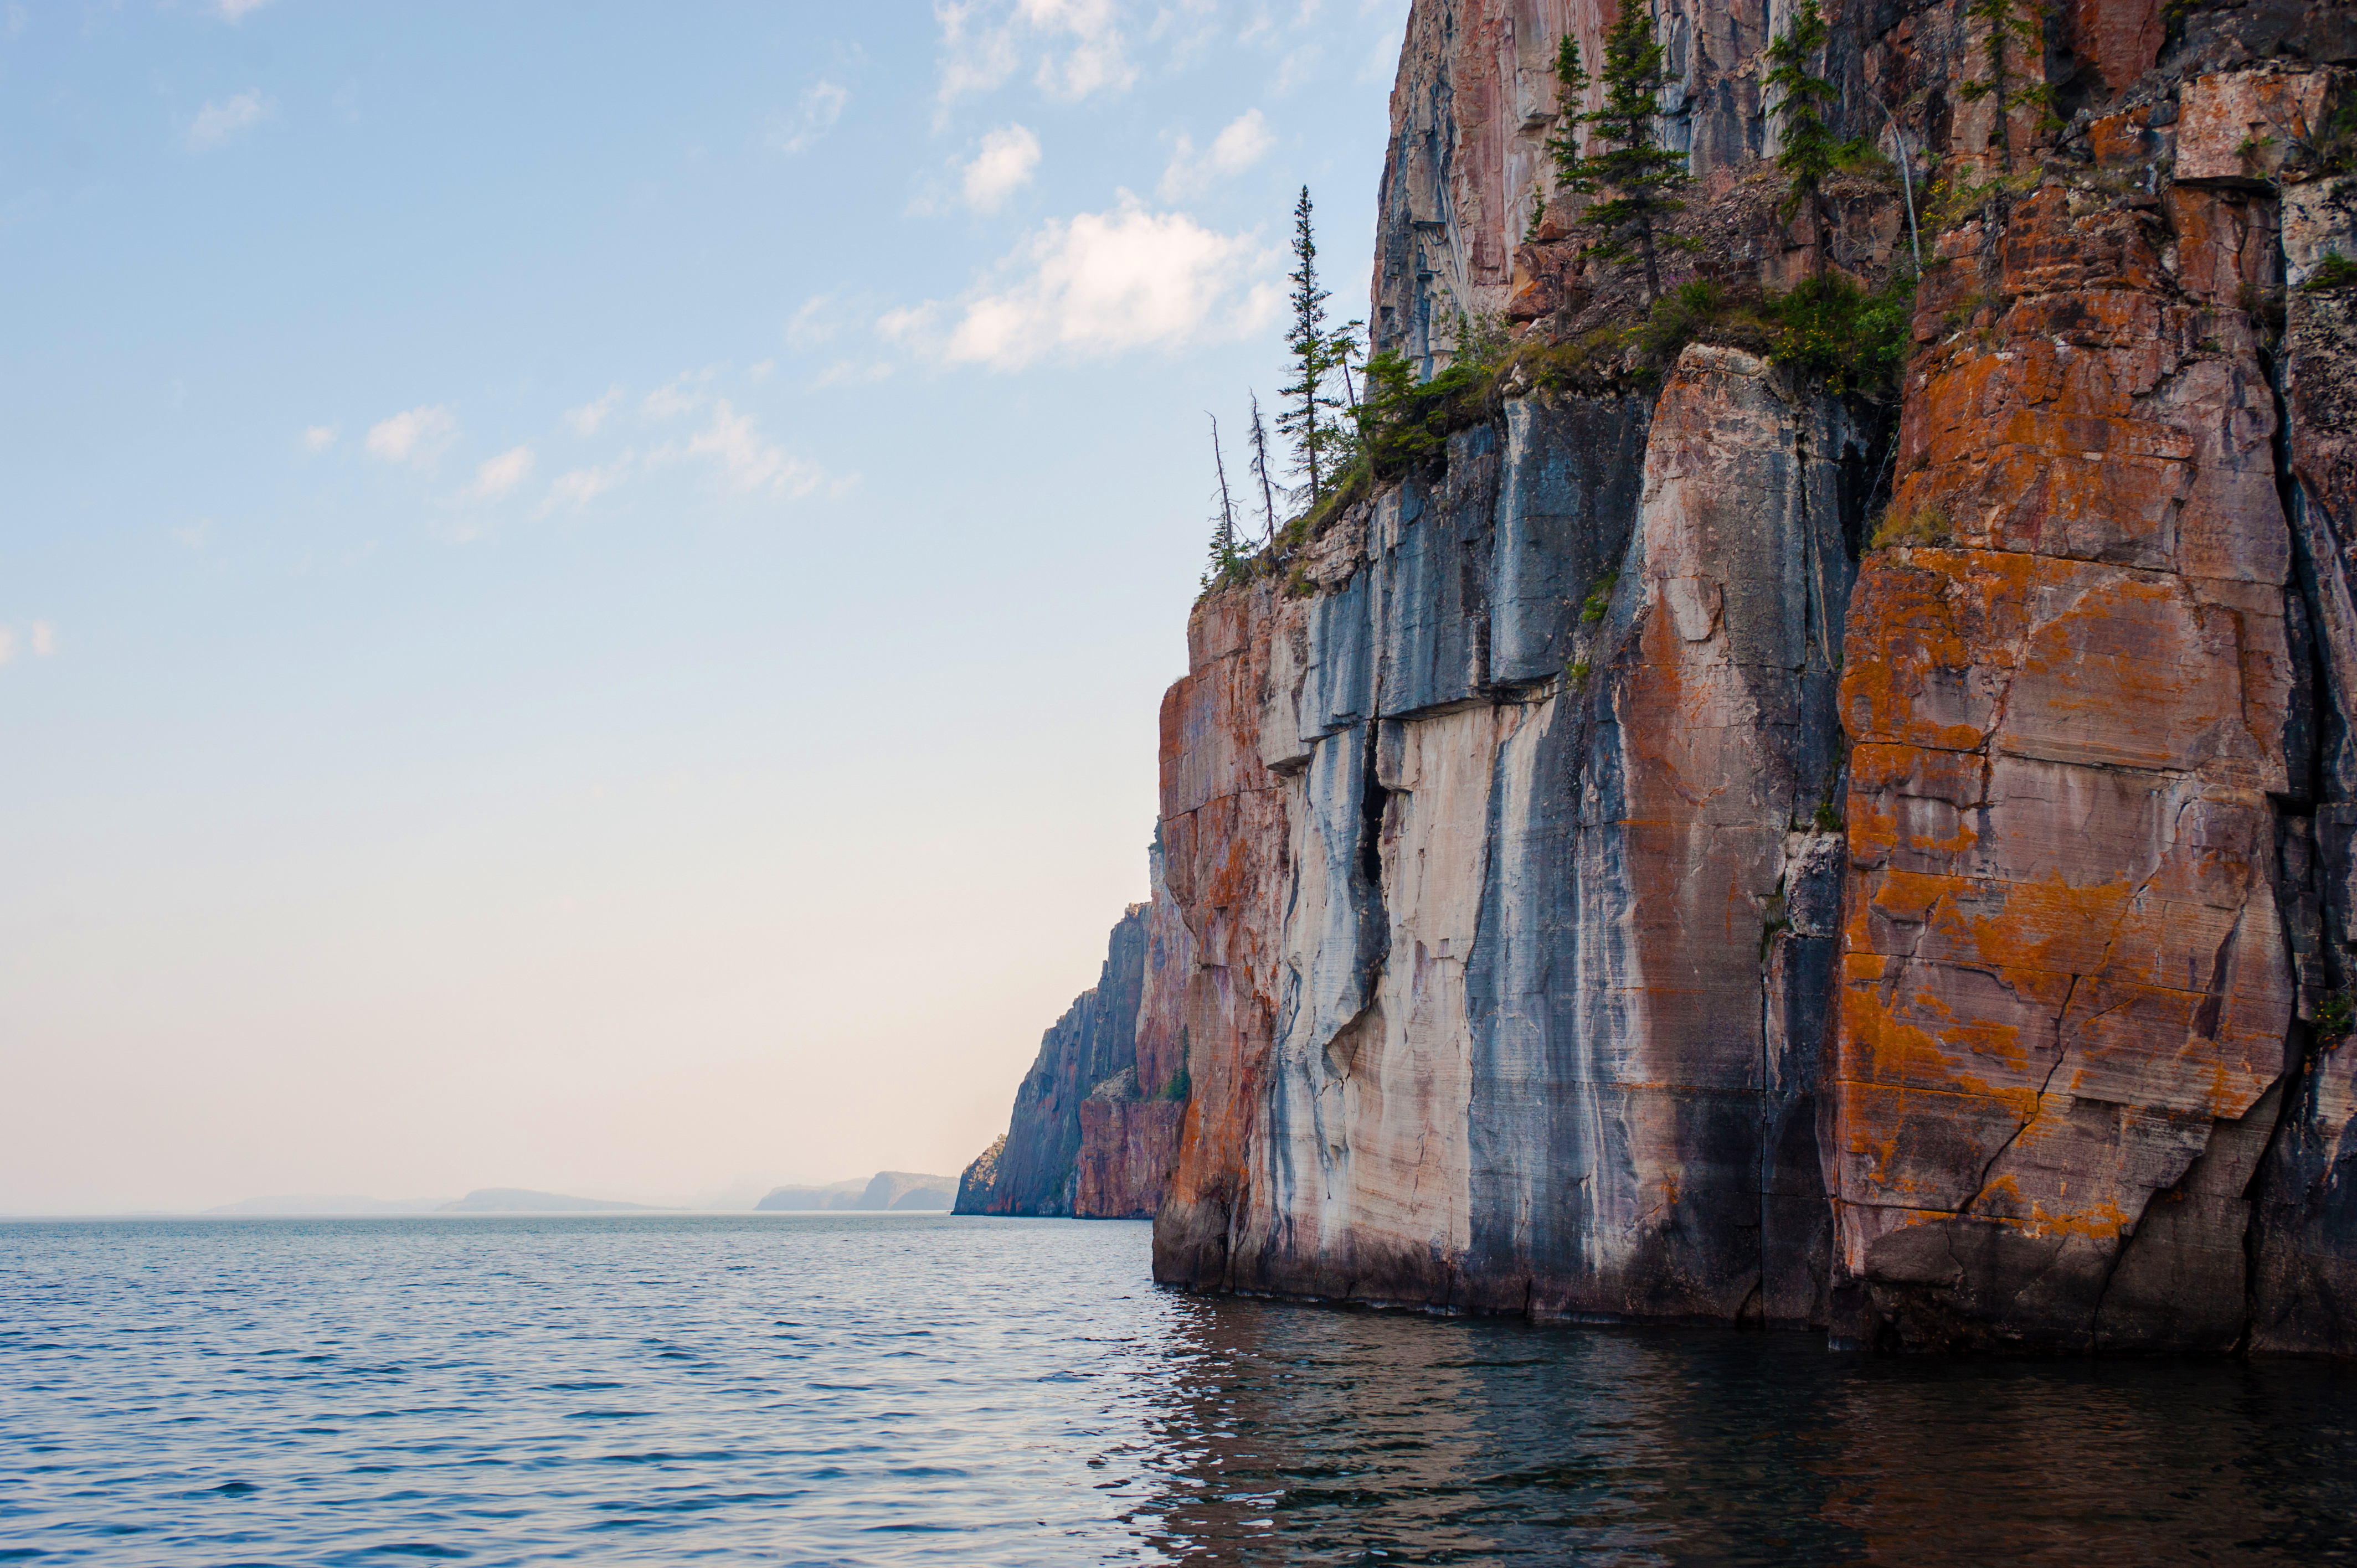 Great Slave Cliffs